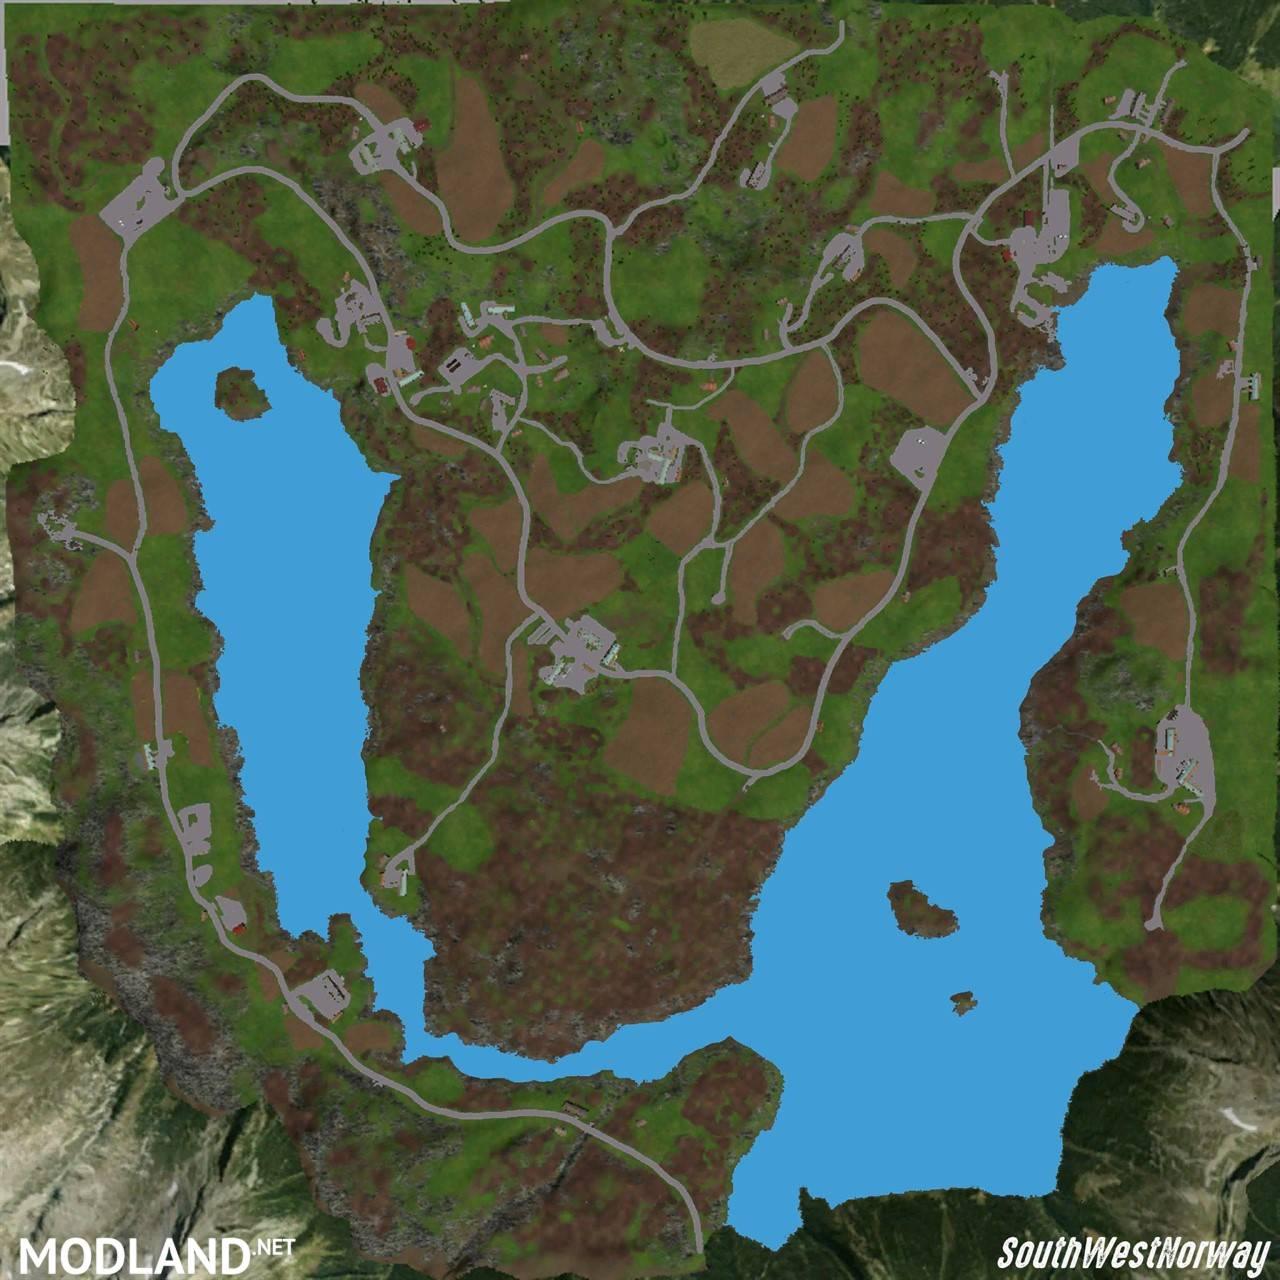 South West Norway Mod For Farming Simulator FS LS - Norway map farming simulator 2013